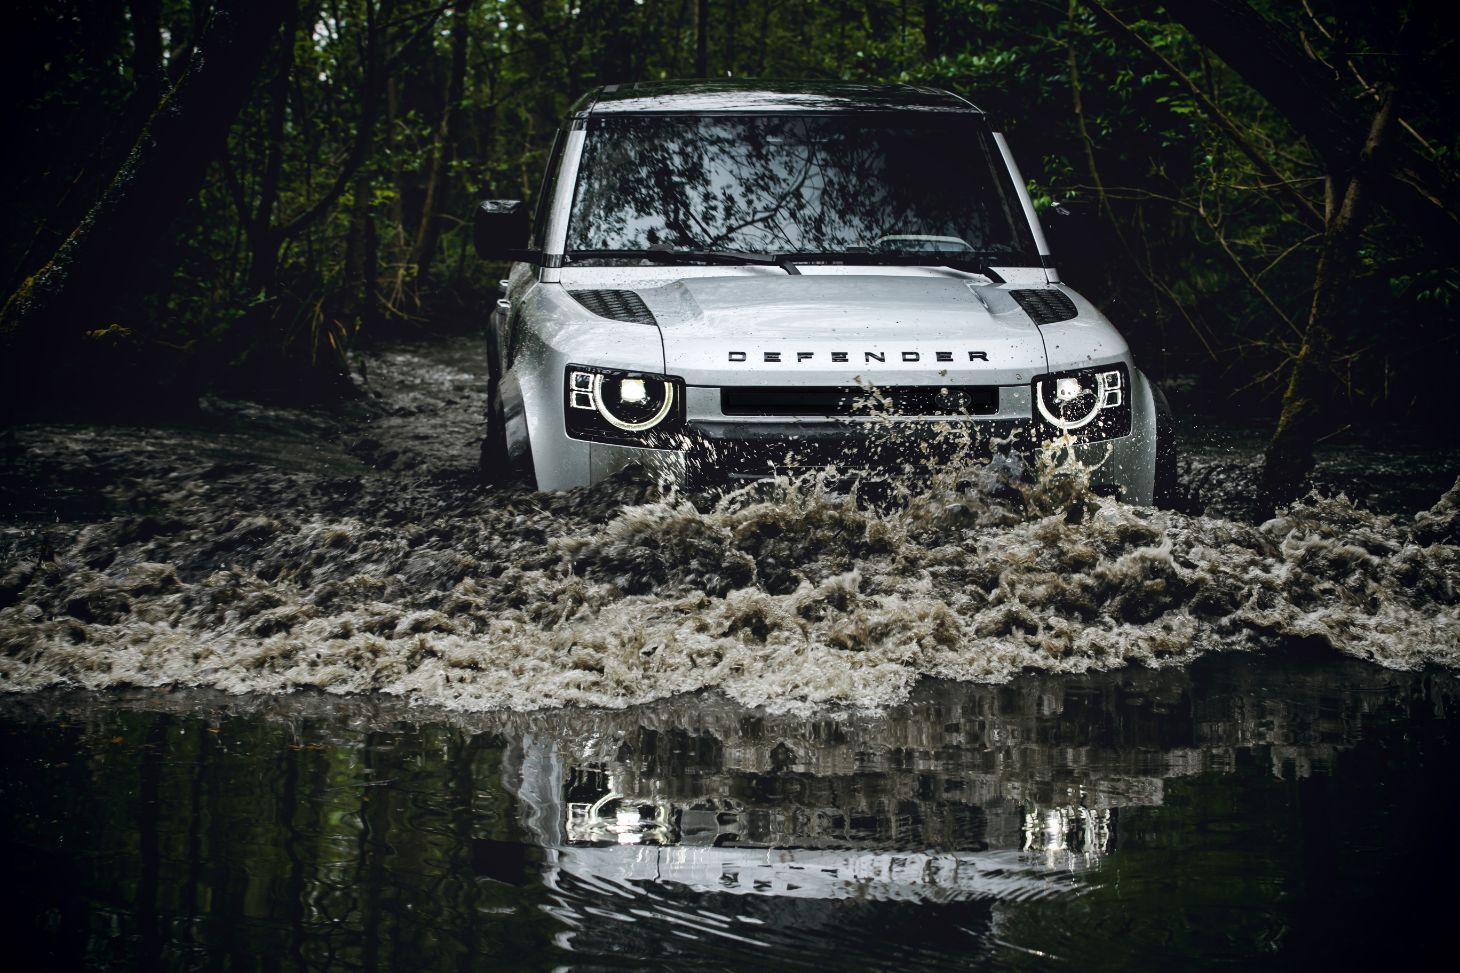 Novo Land Rover Defender atravessando trecho alagado off-road